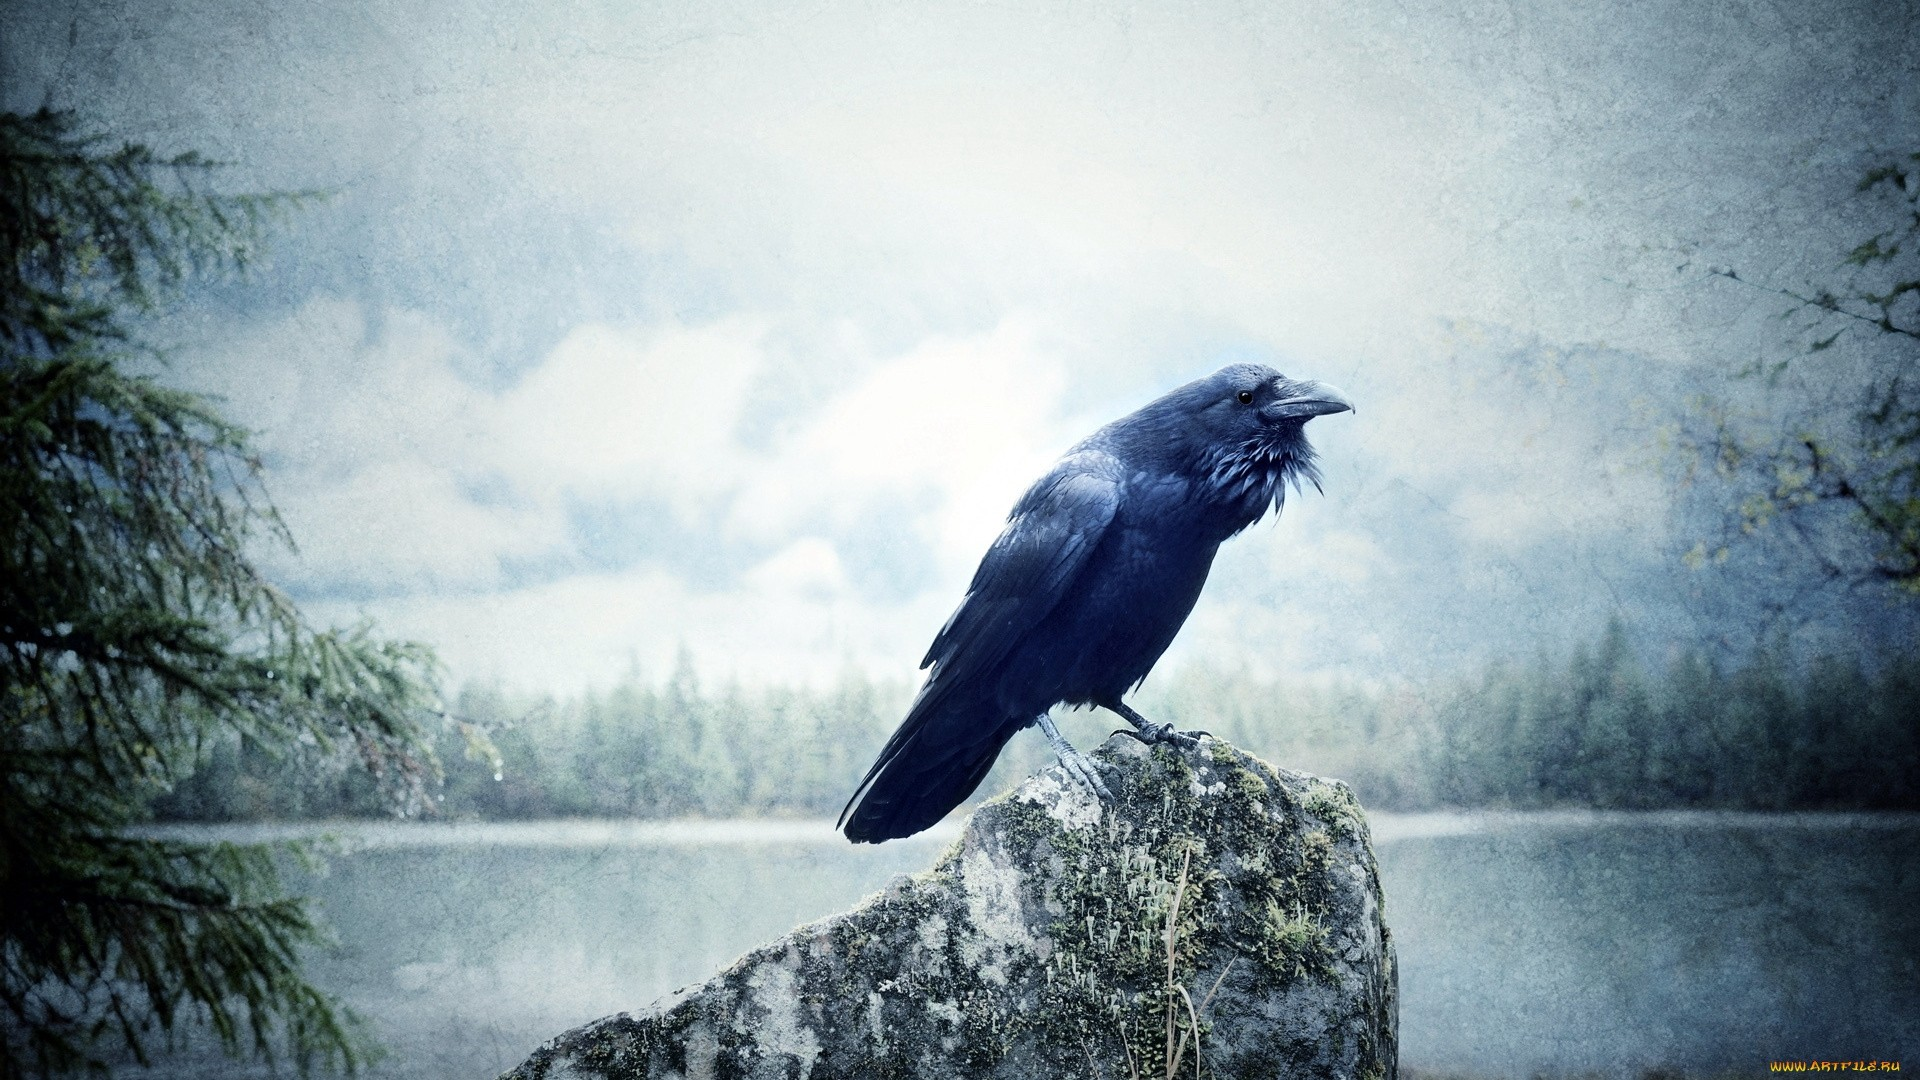 Raven computer wallpaper